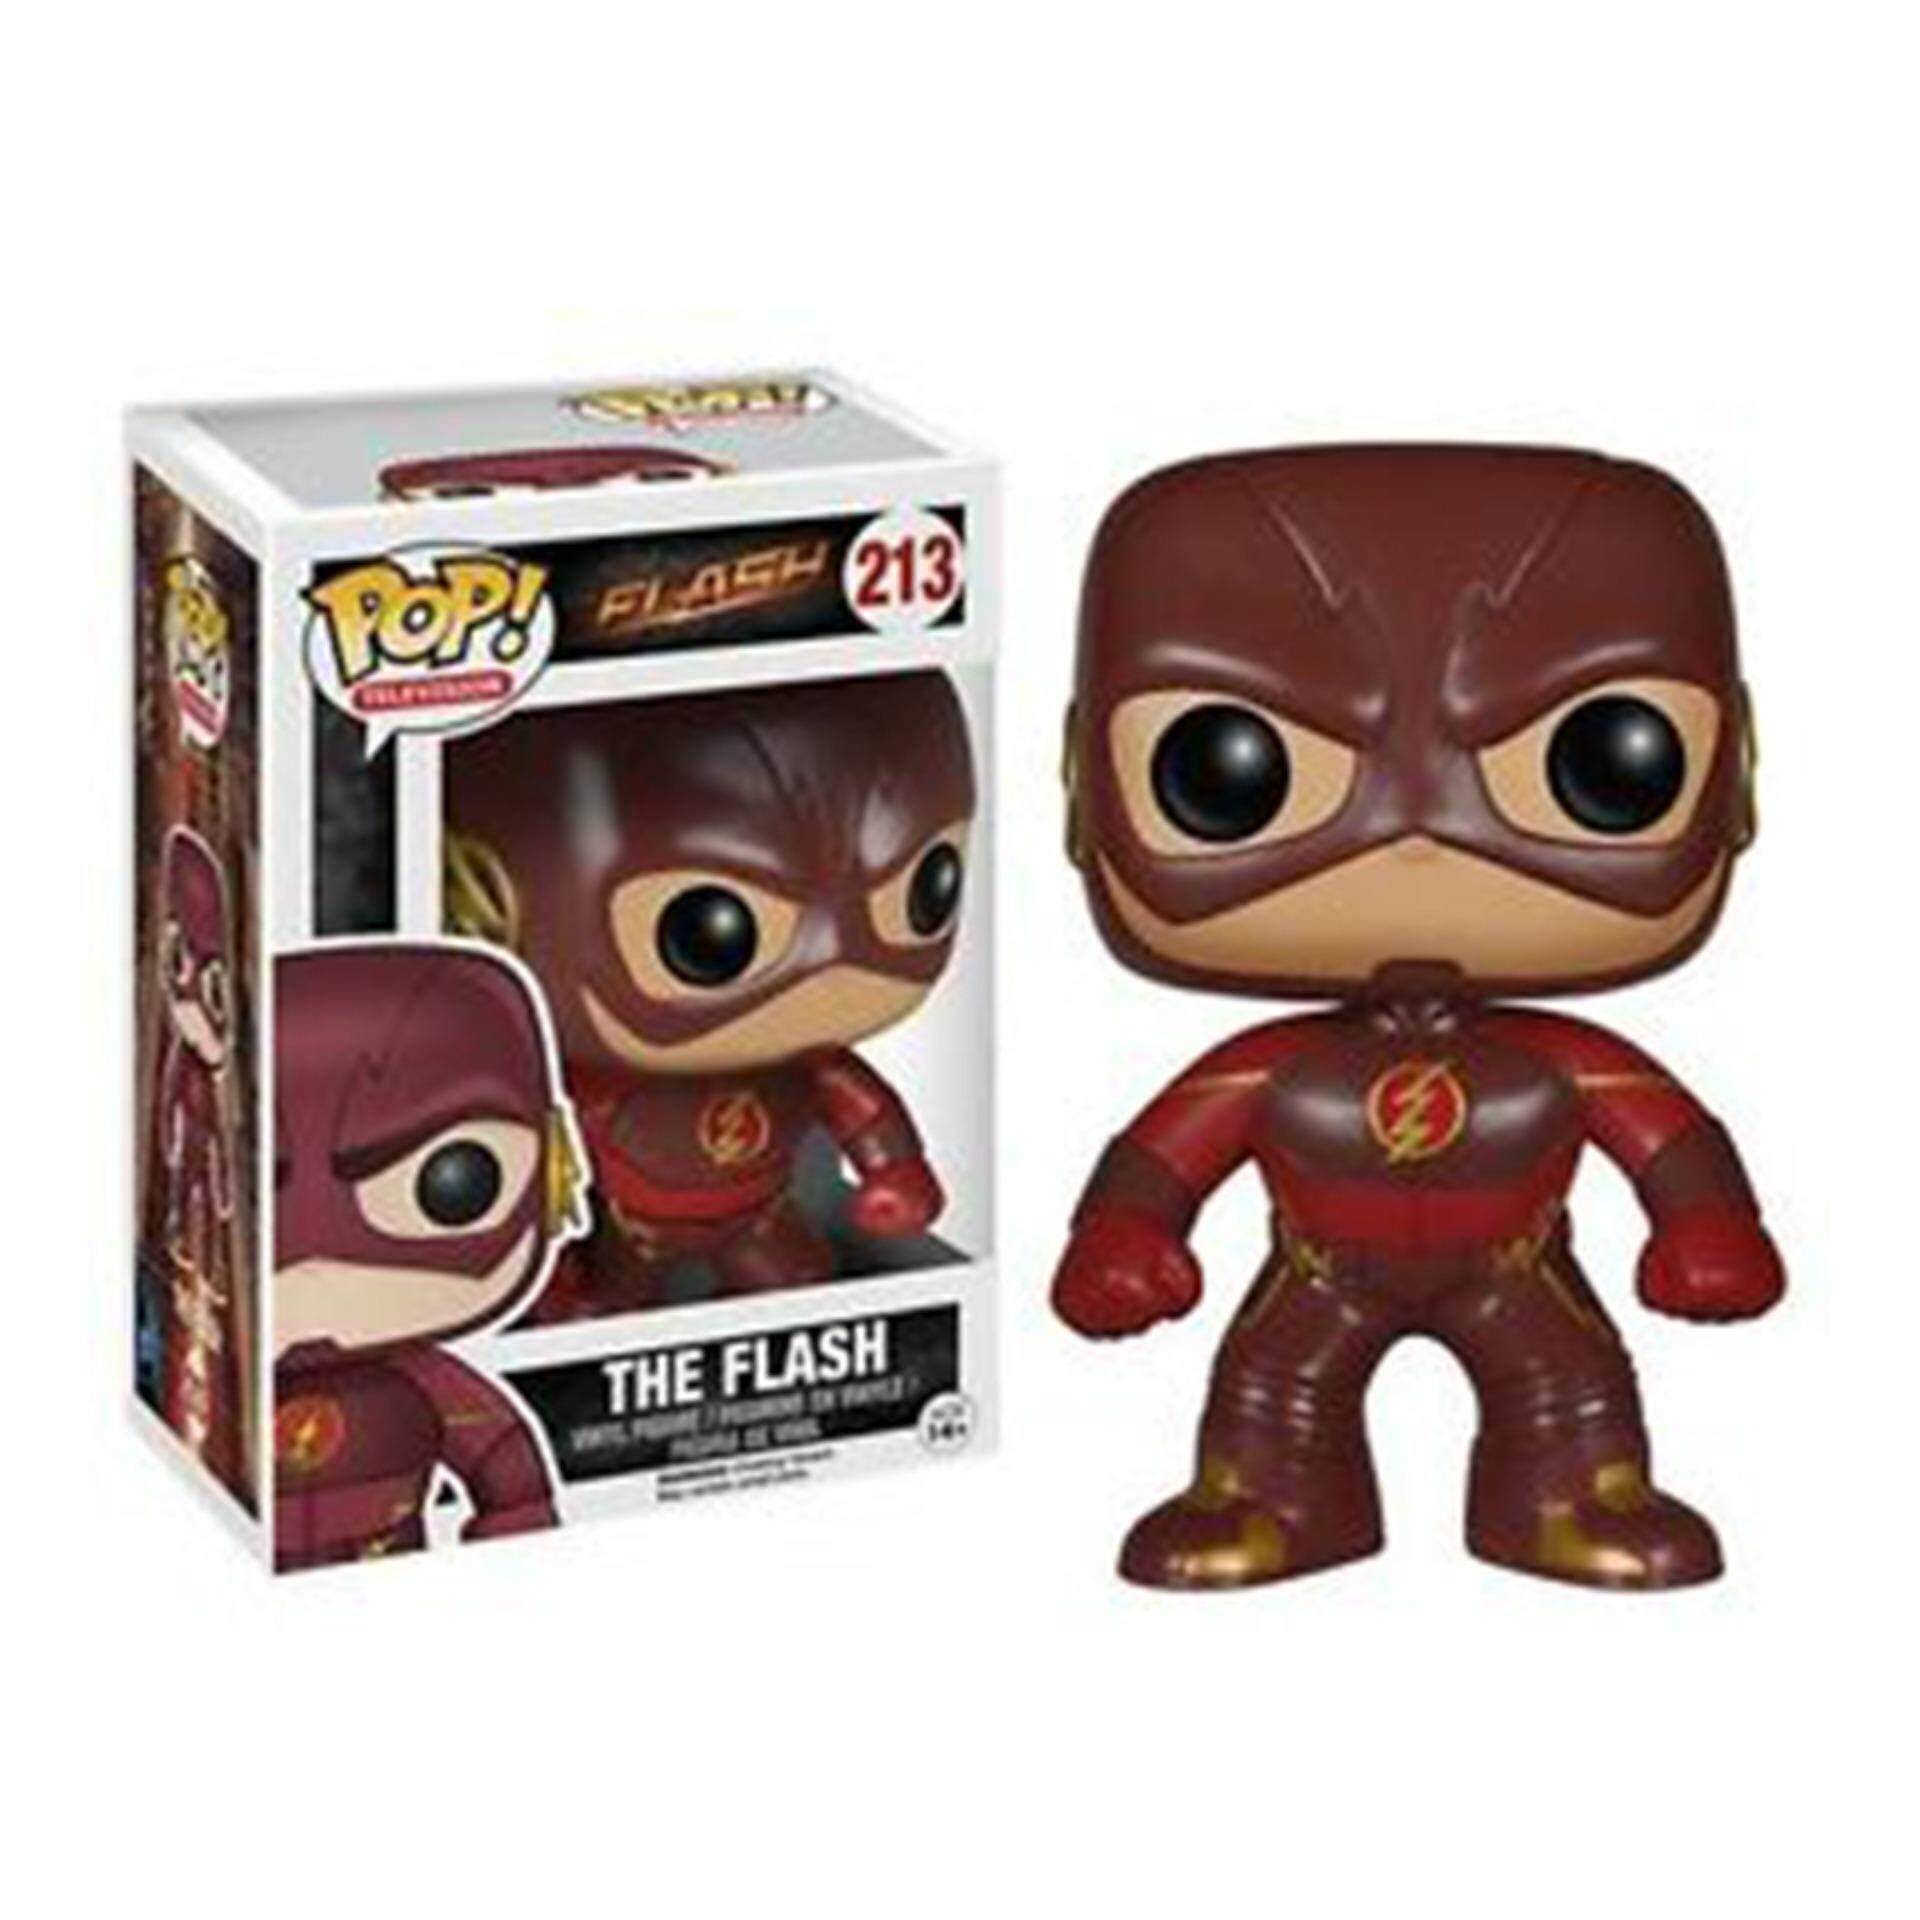 FUNKO POP! TV Series DC Comics The Flash - The Flash Toys for boys